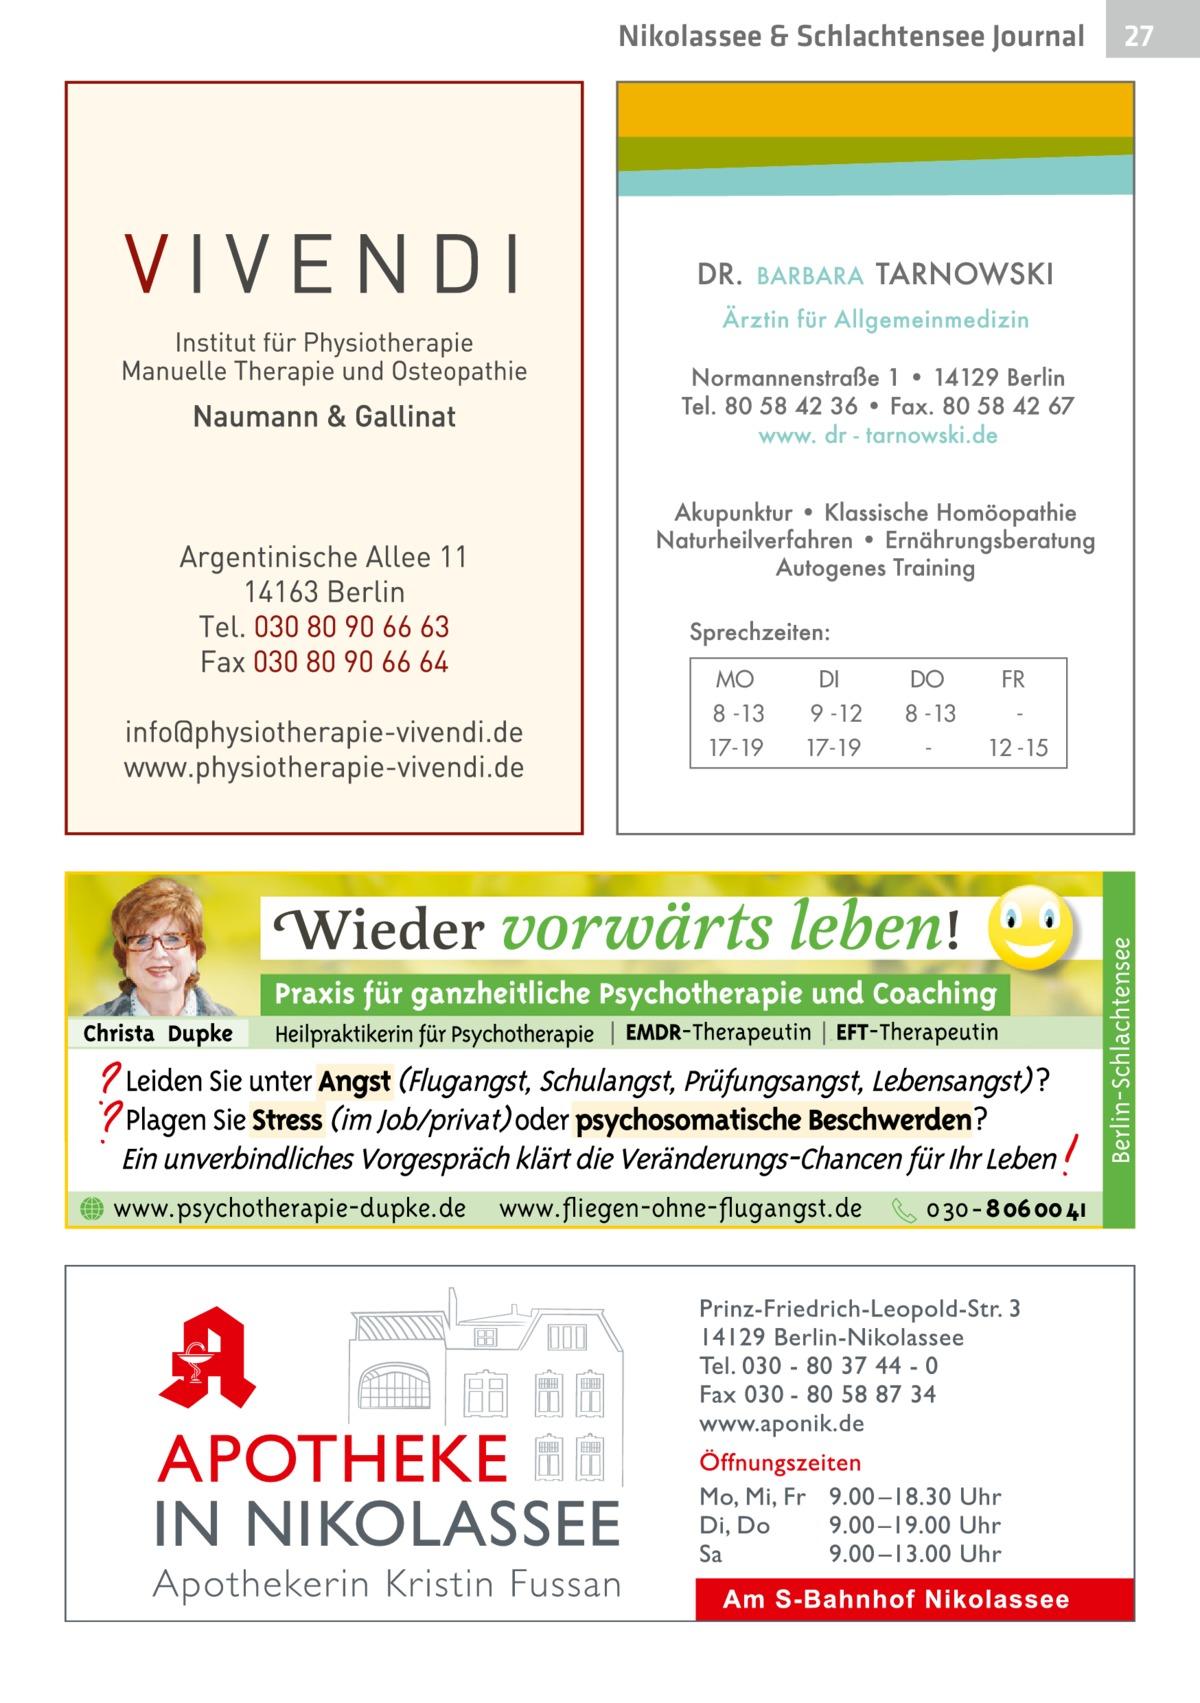 Nikolassee & Schlachtensee Journal  DI 9 -12 17-19  DO 8 -13  FR 12 -15  Berlin-Schlachtensee  MO 8 -13 17-19  27  www.psychotherapie-dupke.de  www.fliegen-ohne-flugangst.de